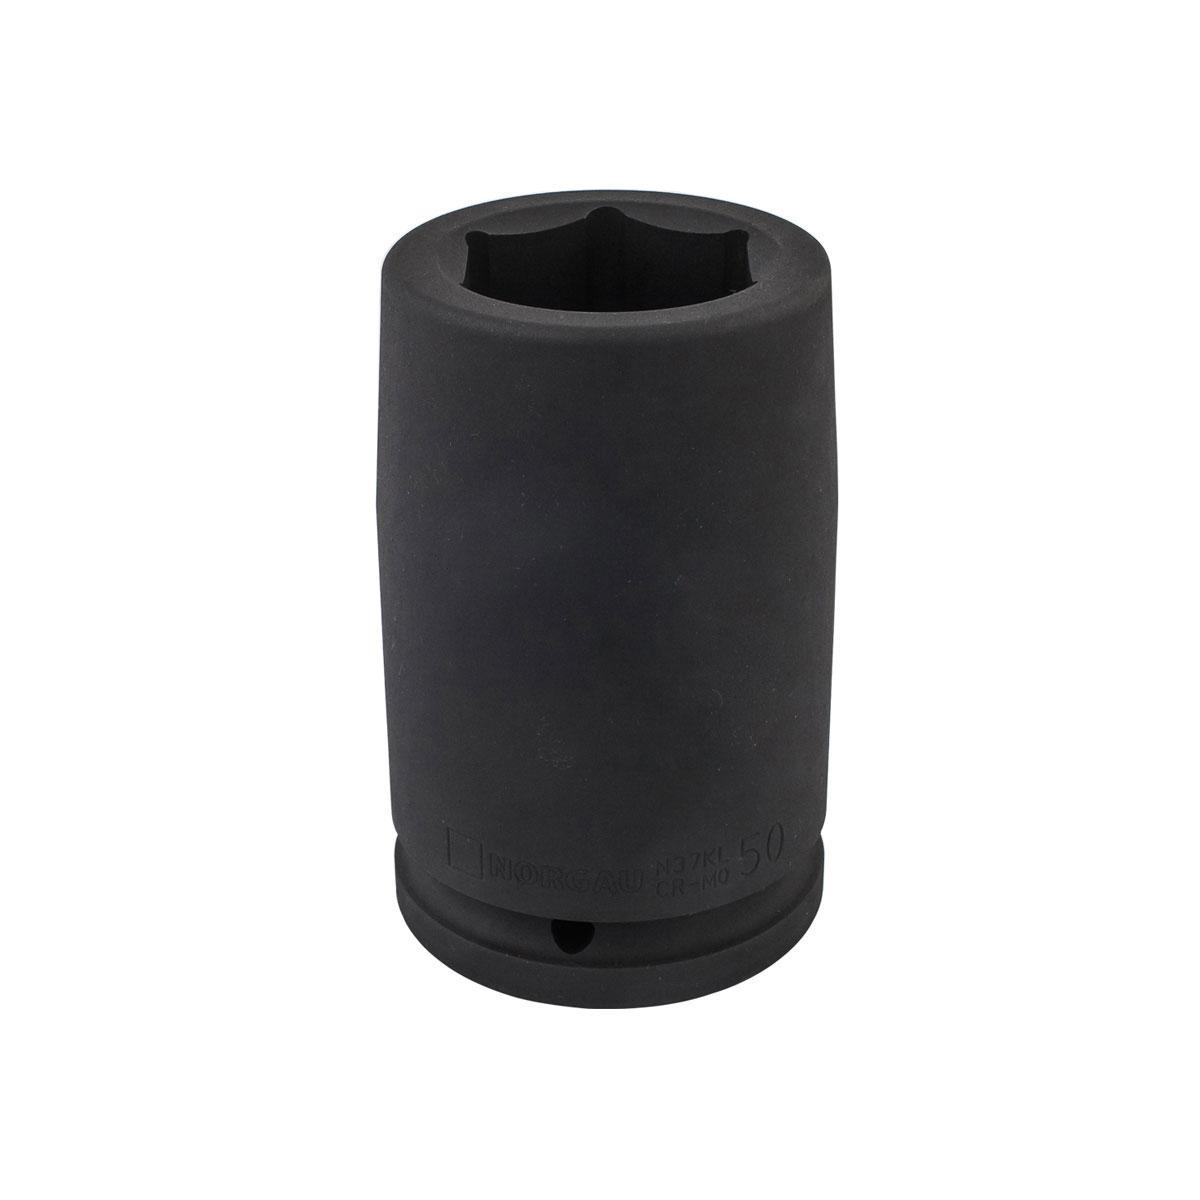 Головка Norgau N37kl-50 (064085050) головка norgau n37kl 80 064085080